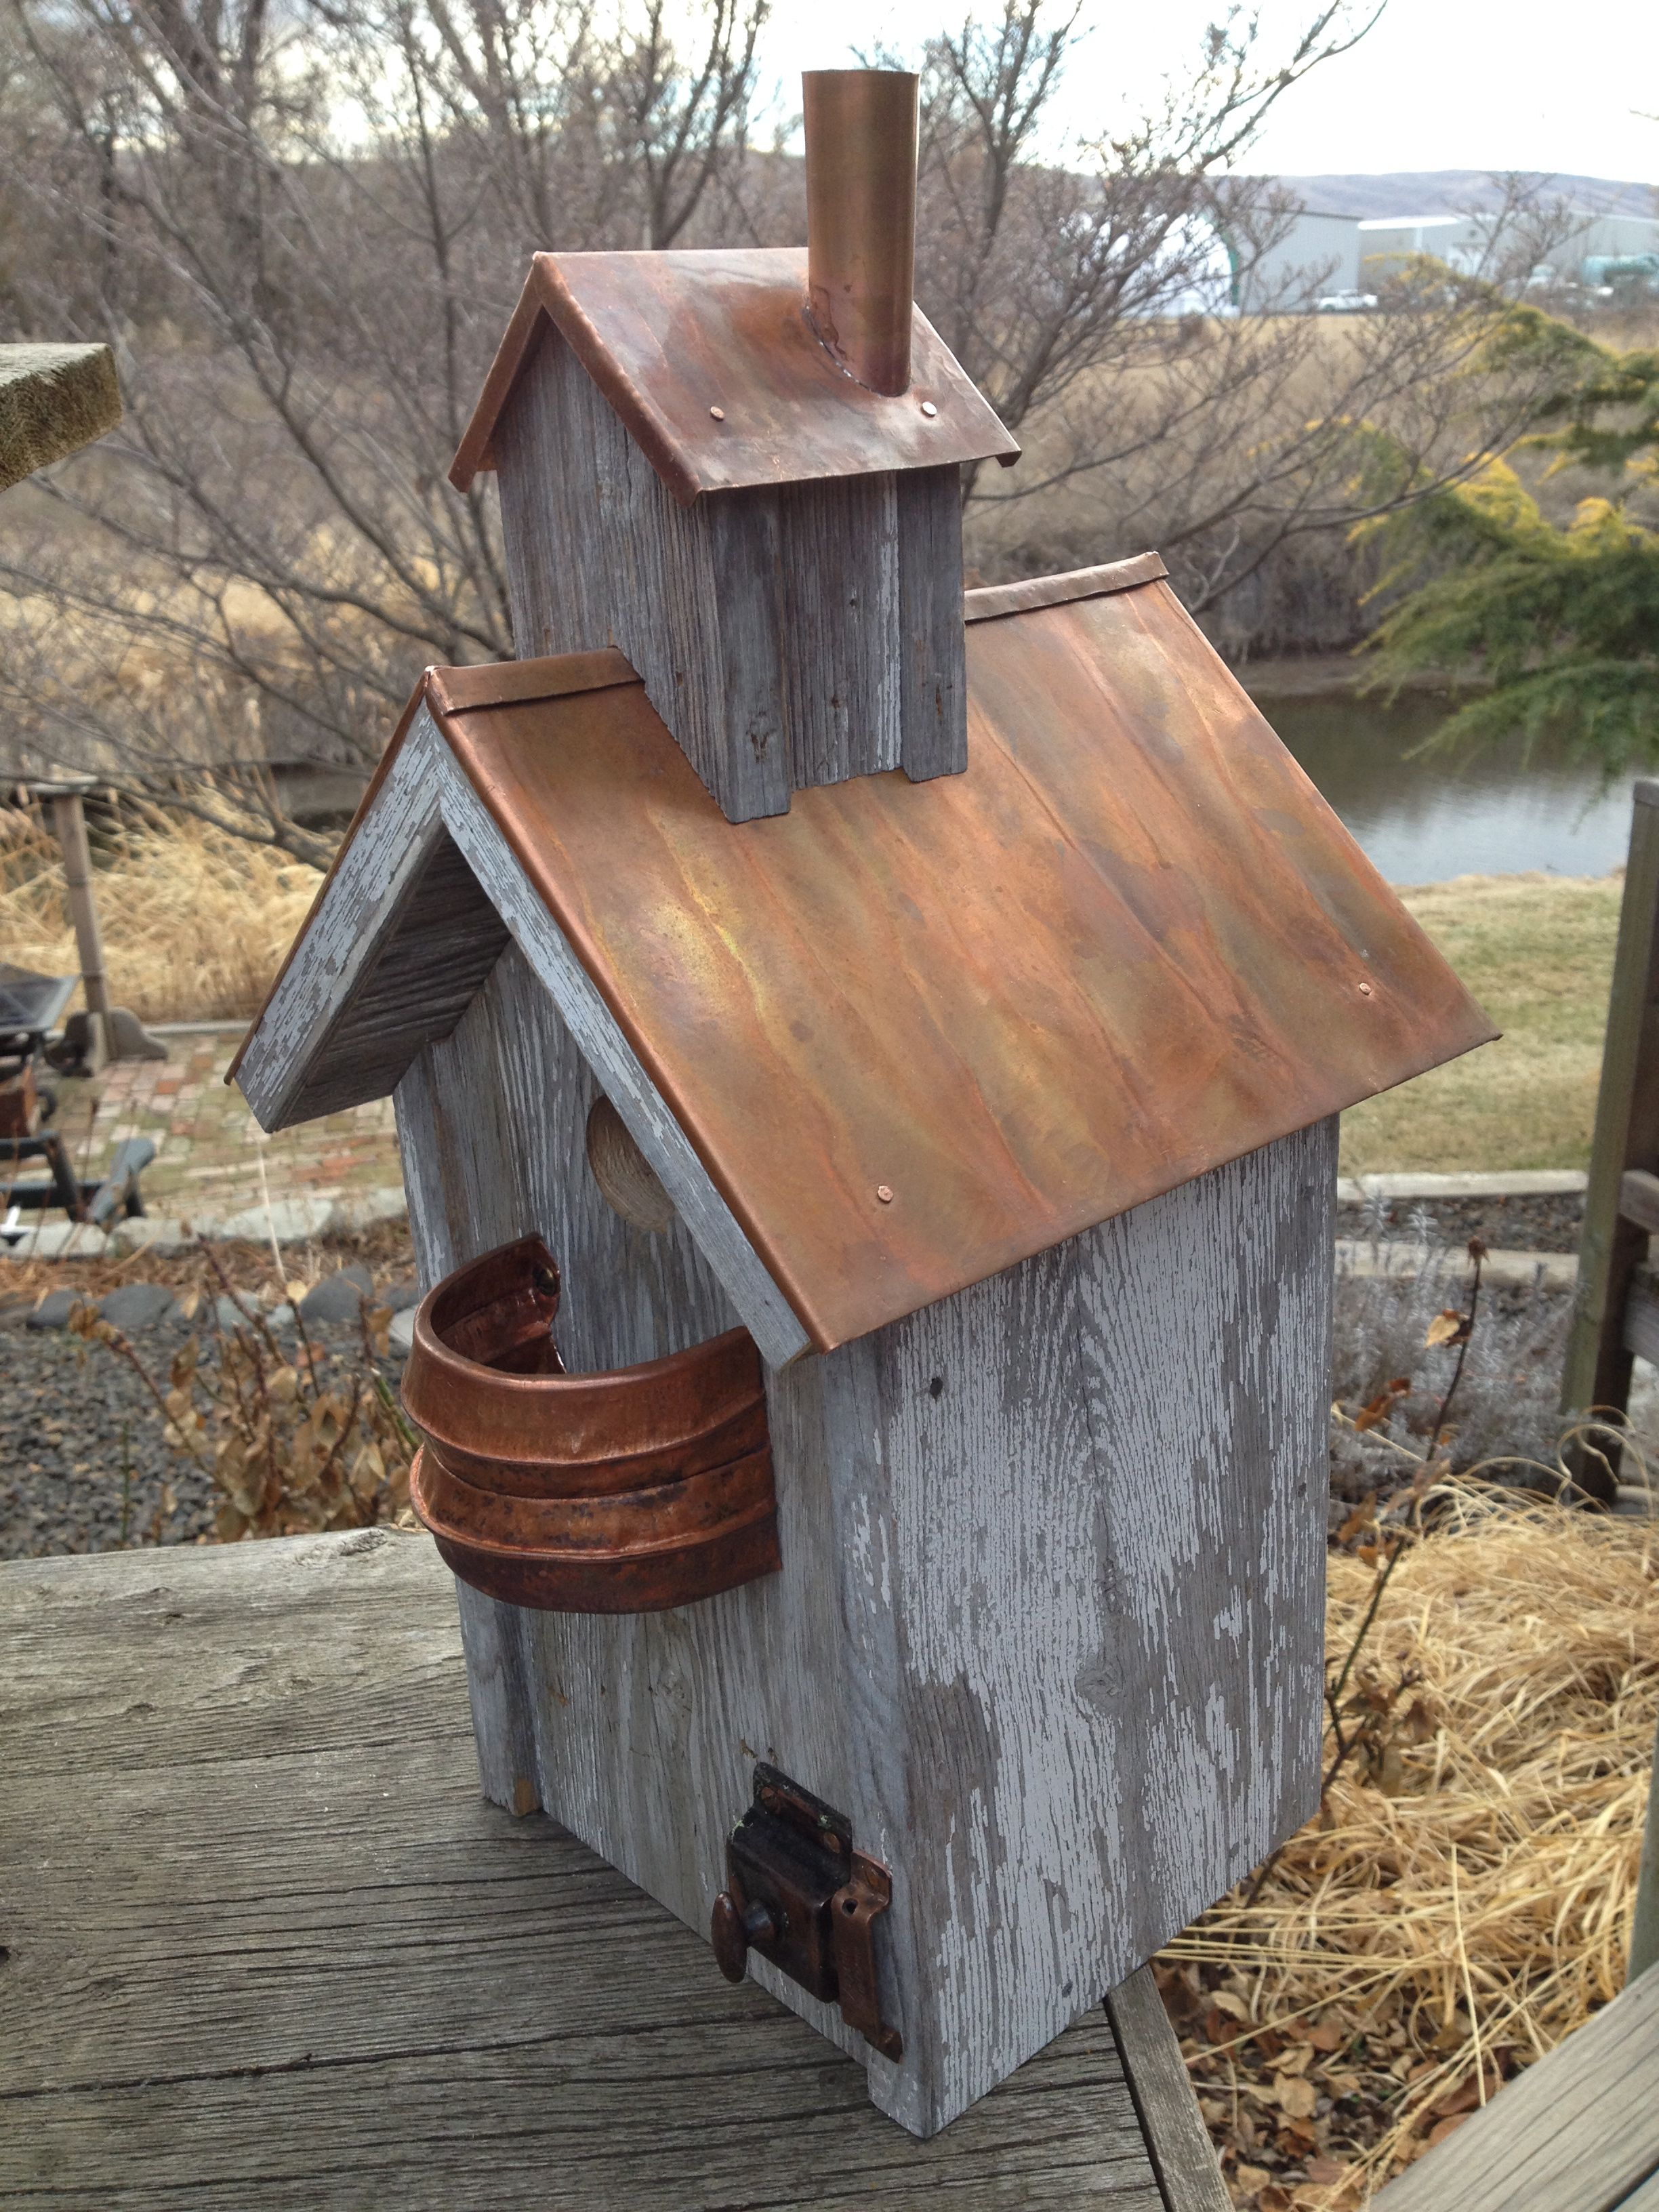 Stunning Copper Roof Decorative Bird Houses Bird House Feeder Bird House